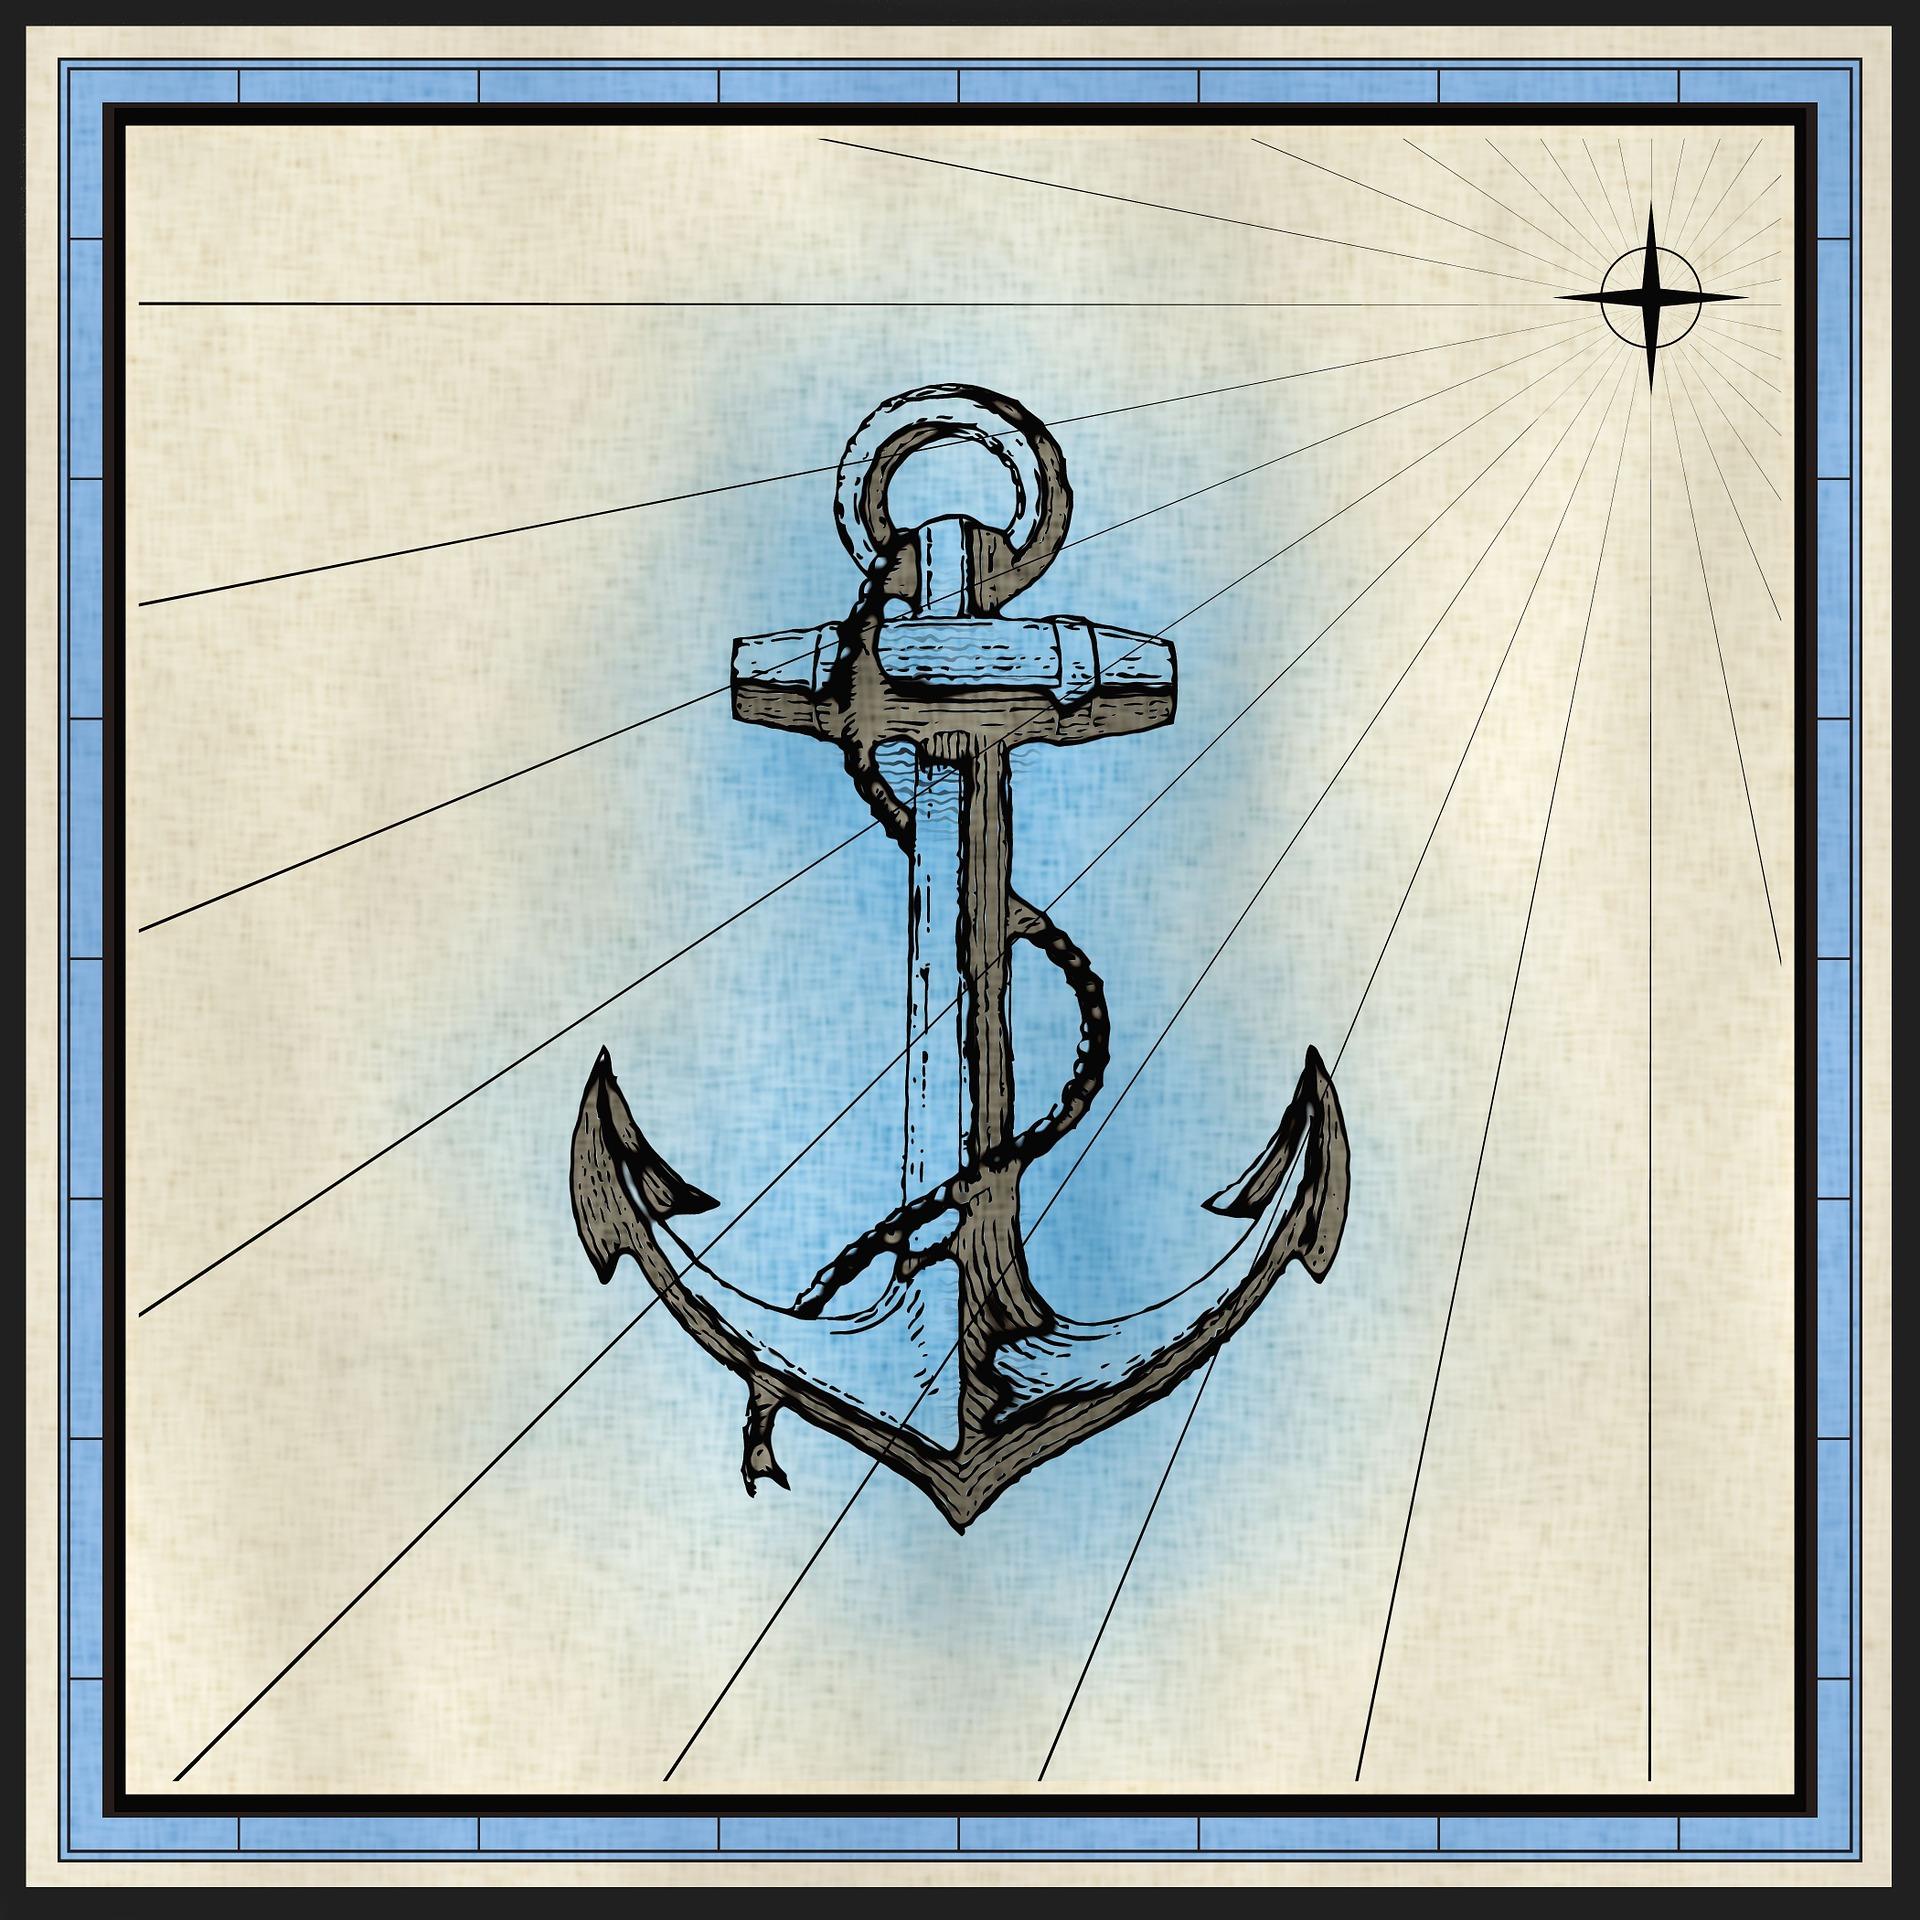 anchor-1422289_1920.jpg